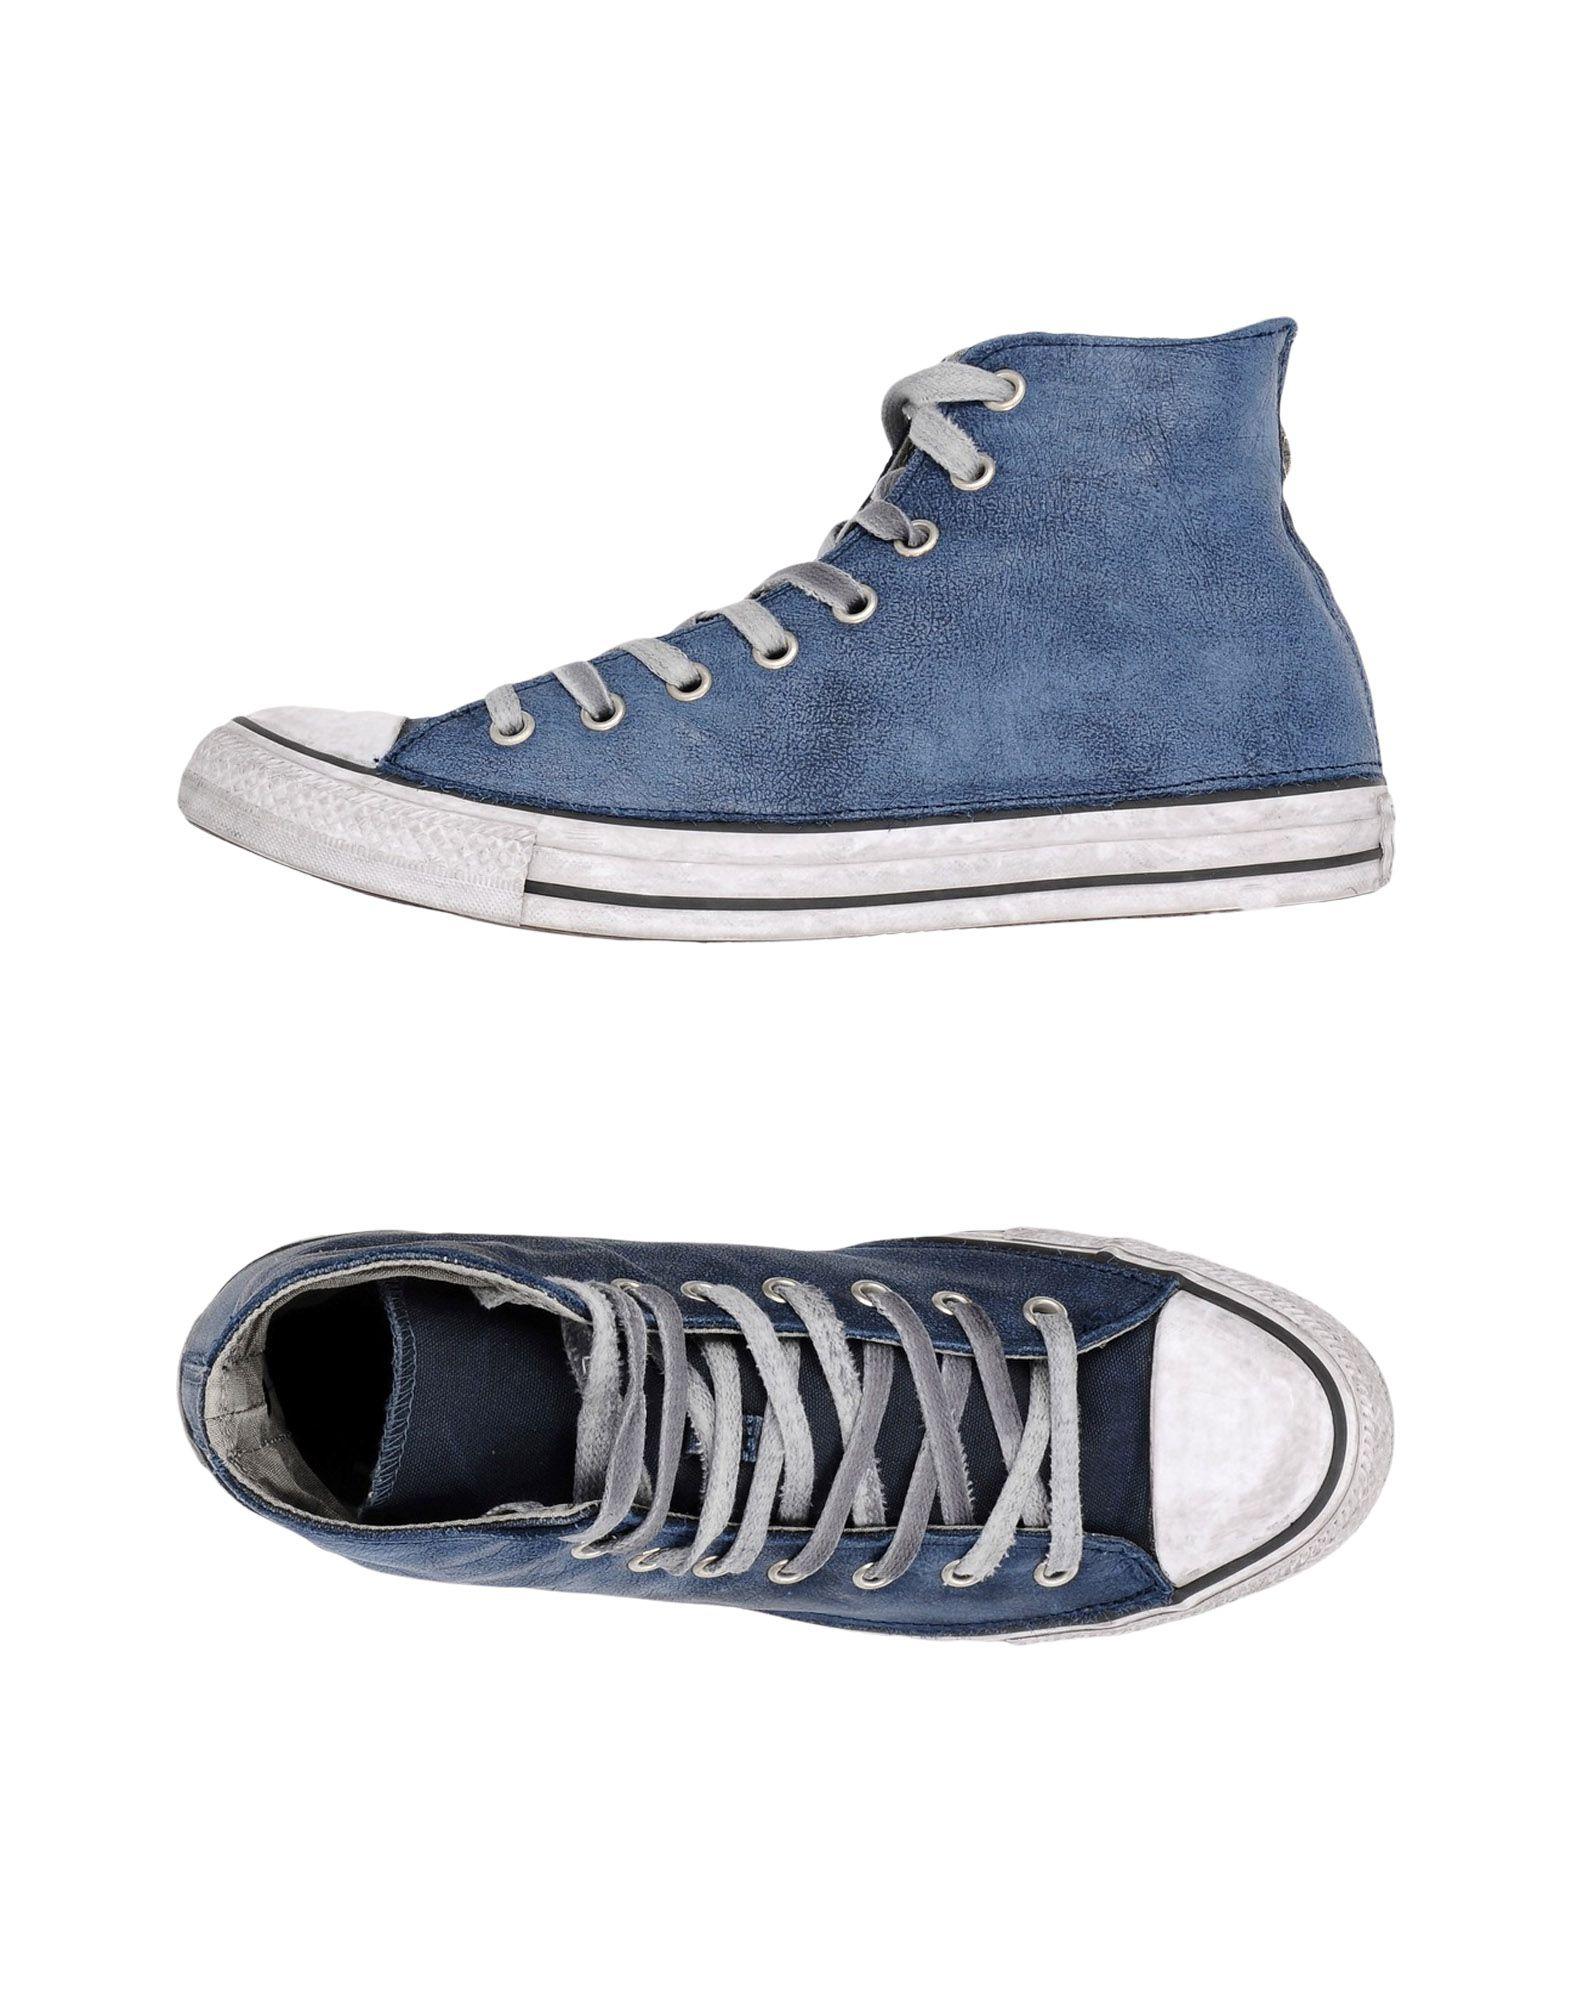 Sneakers Converse Limited Edition Ctas Hi Canvas Canvas/Leather Ltd - Uomo - 11394444NI